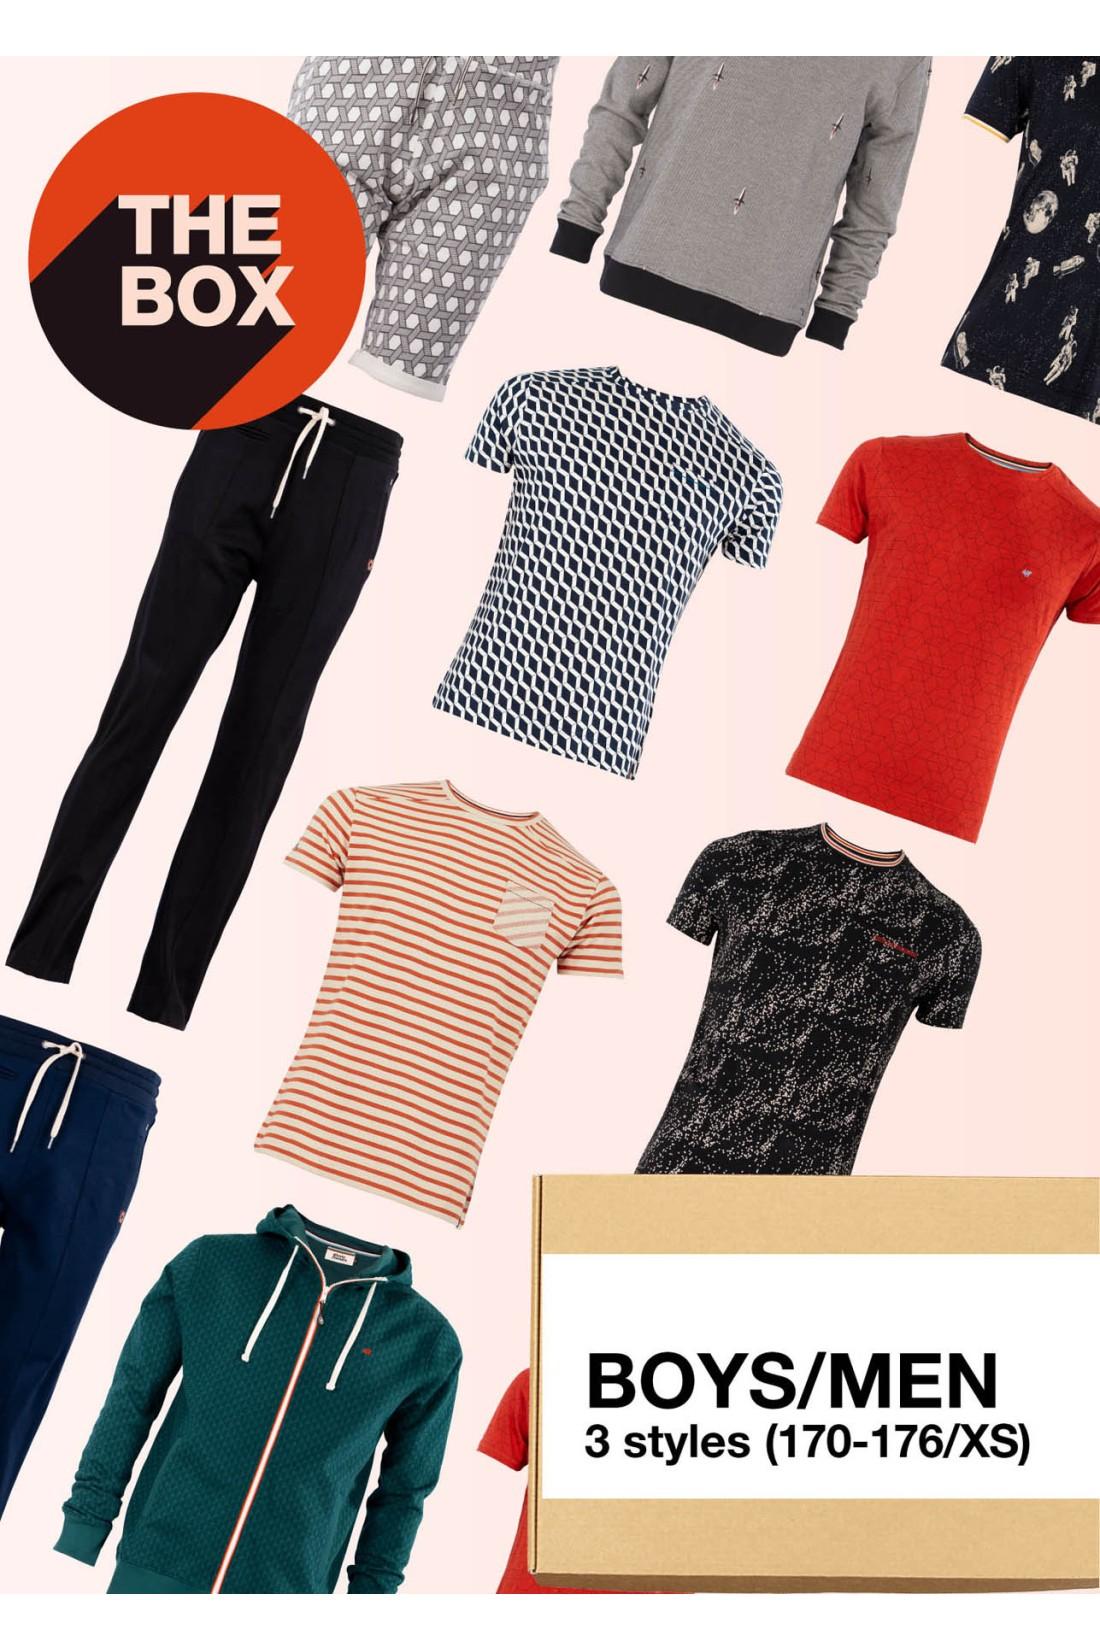 Surprise Box Men - THE BOX - 3 Styles XS - 170/176